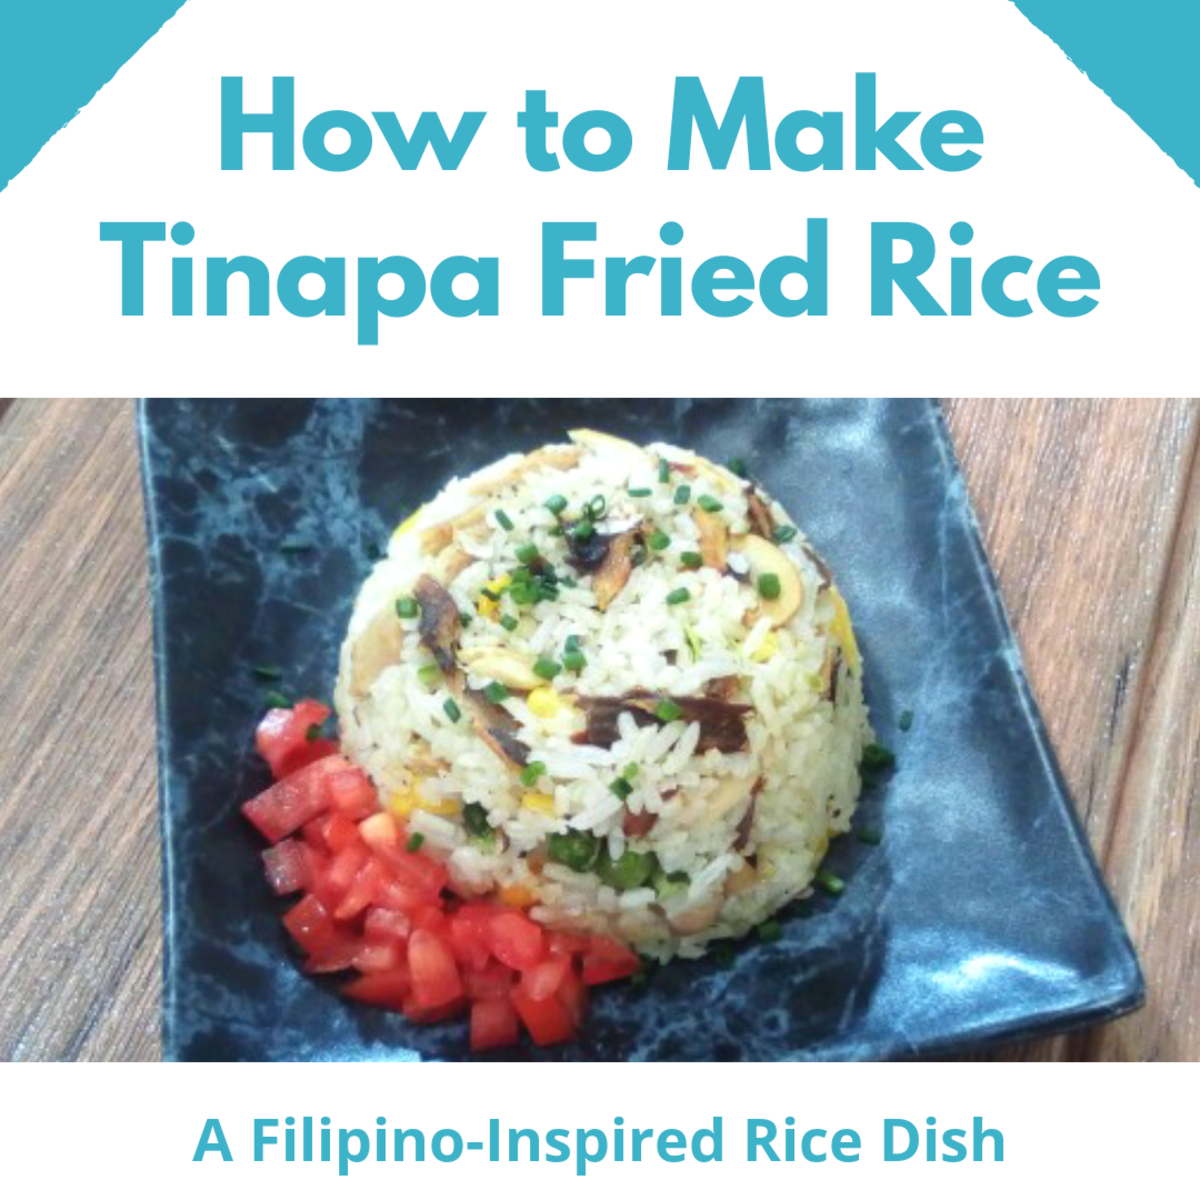 how to make tinapa fried rice